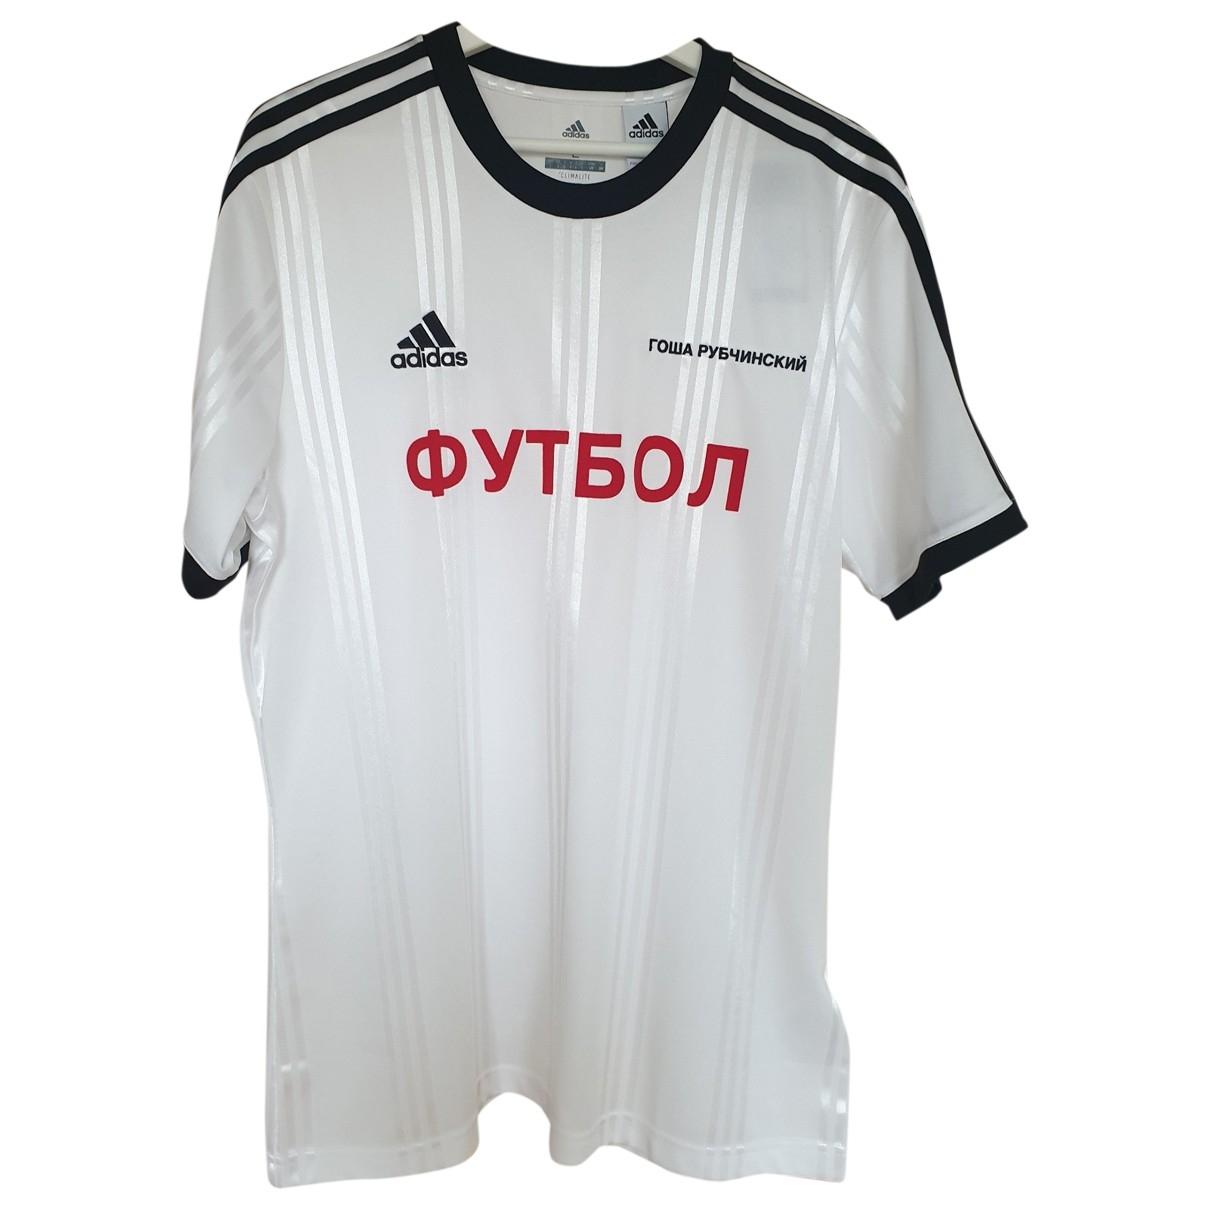 Adidas X Gosha Rubchinskiy N White Synthetic T-shirts